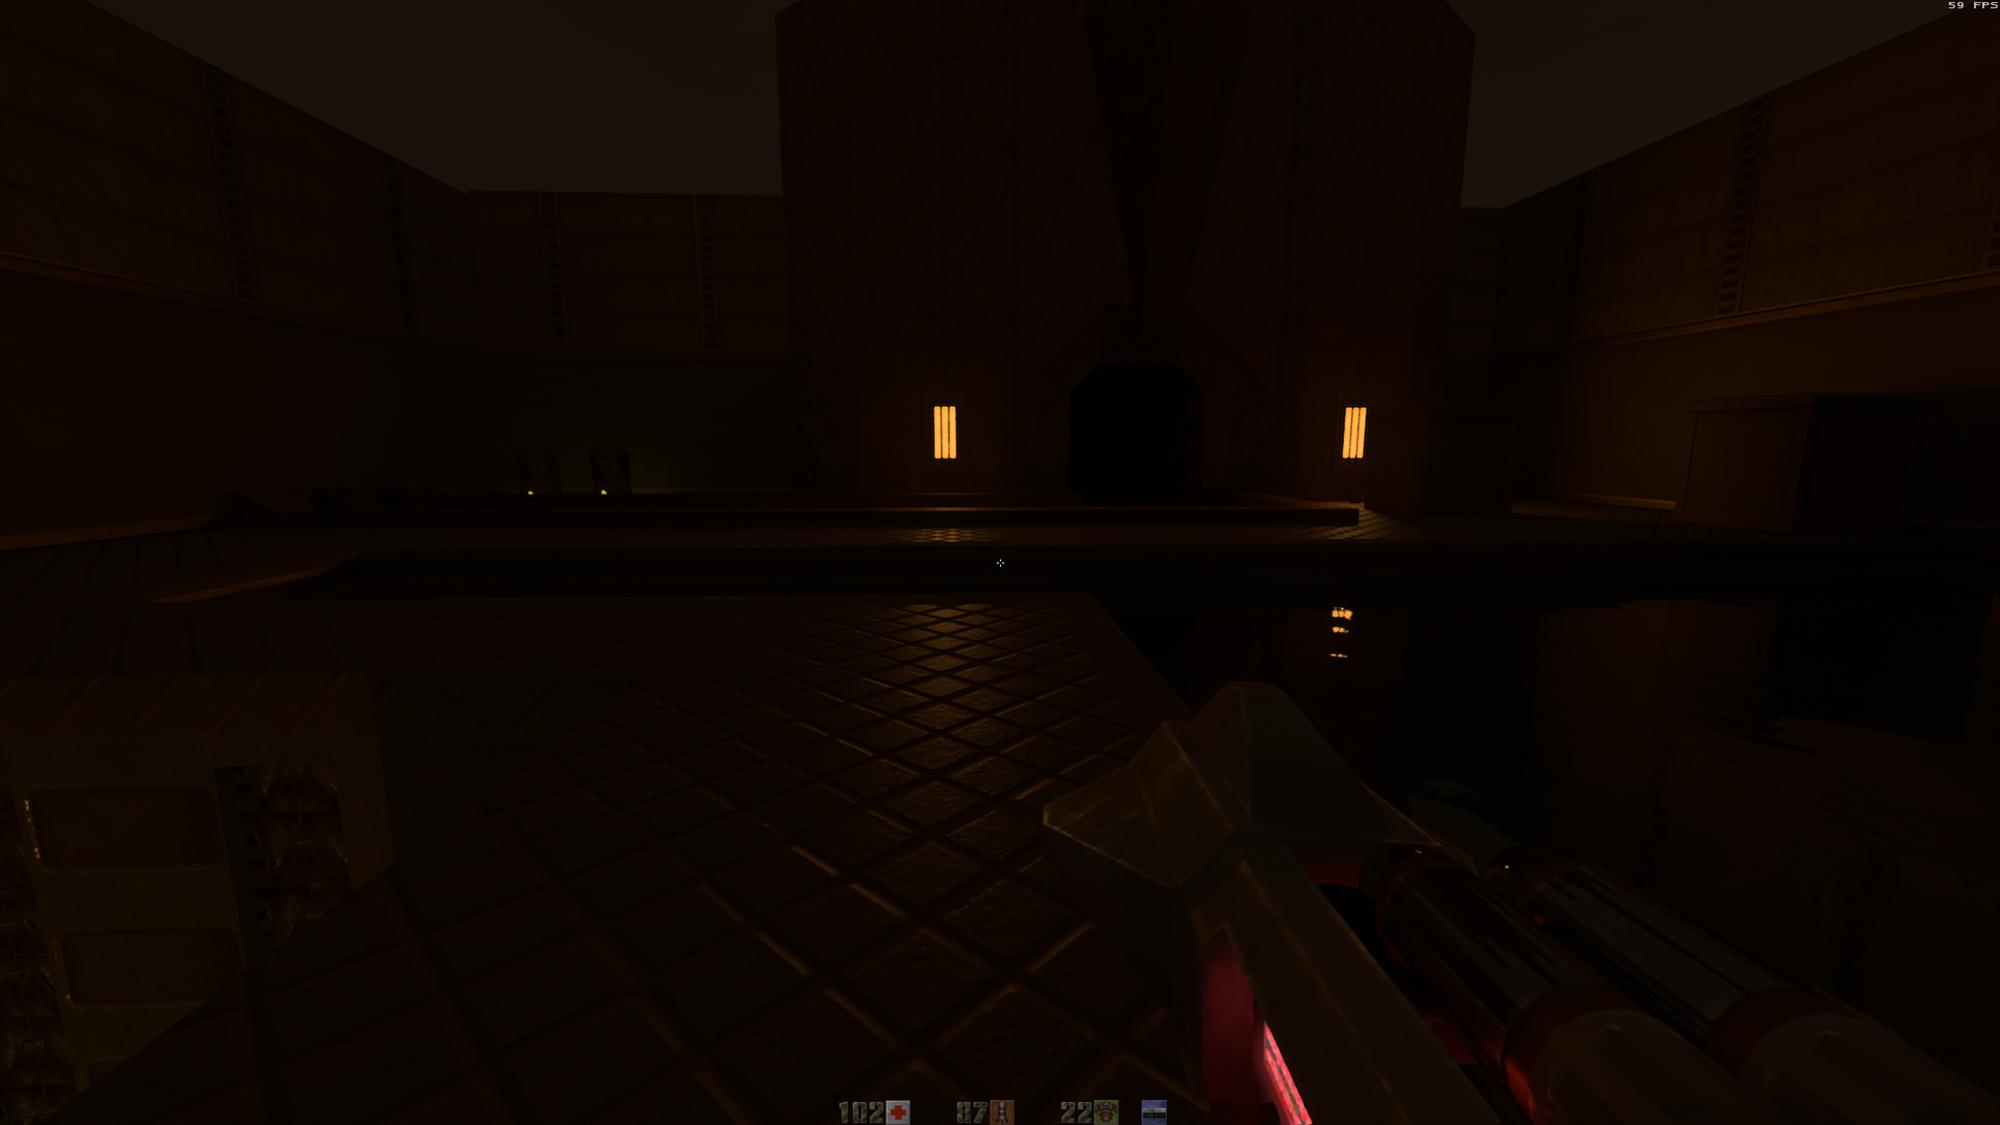 Quake 2 RTX Remaster Screenshot 2019.11.29 - 17.50.34.94.png